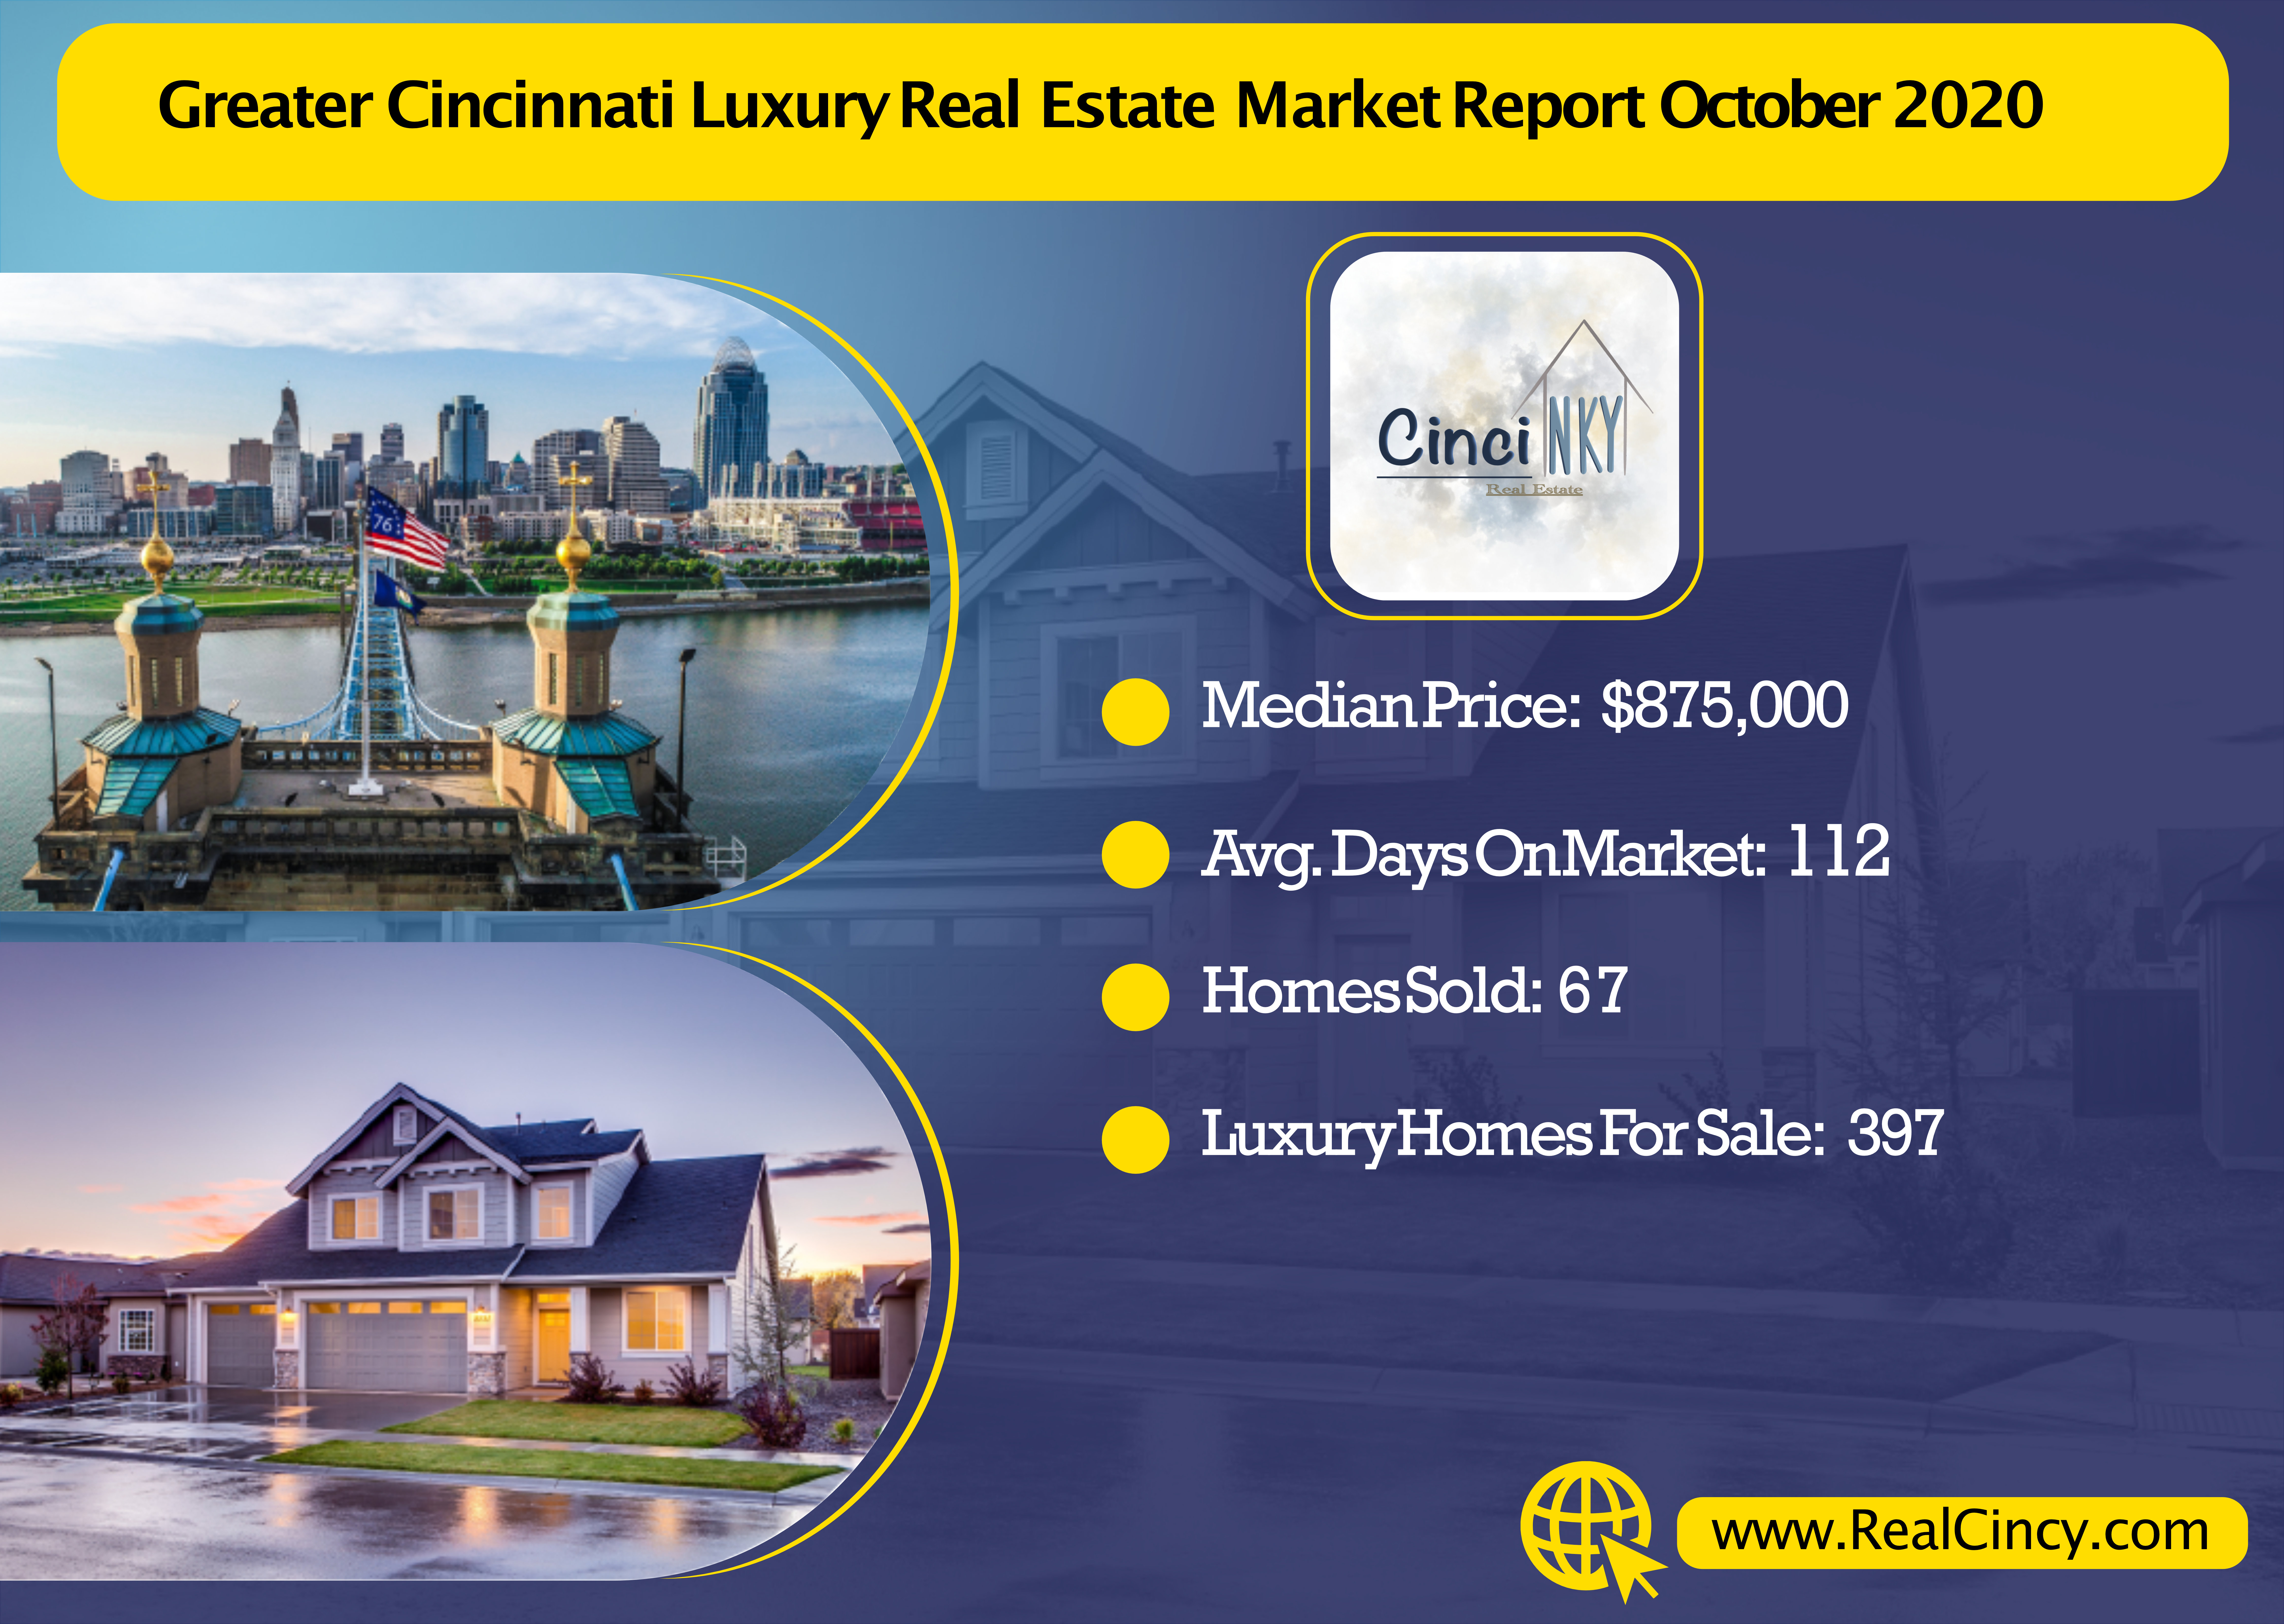 September 2020 Greater Cincinnati Luxury Real Estate Market Report